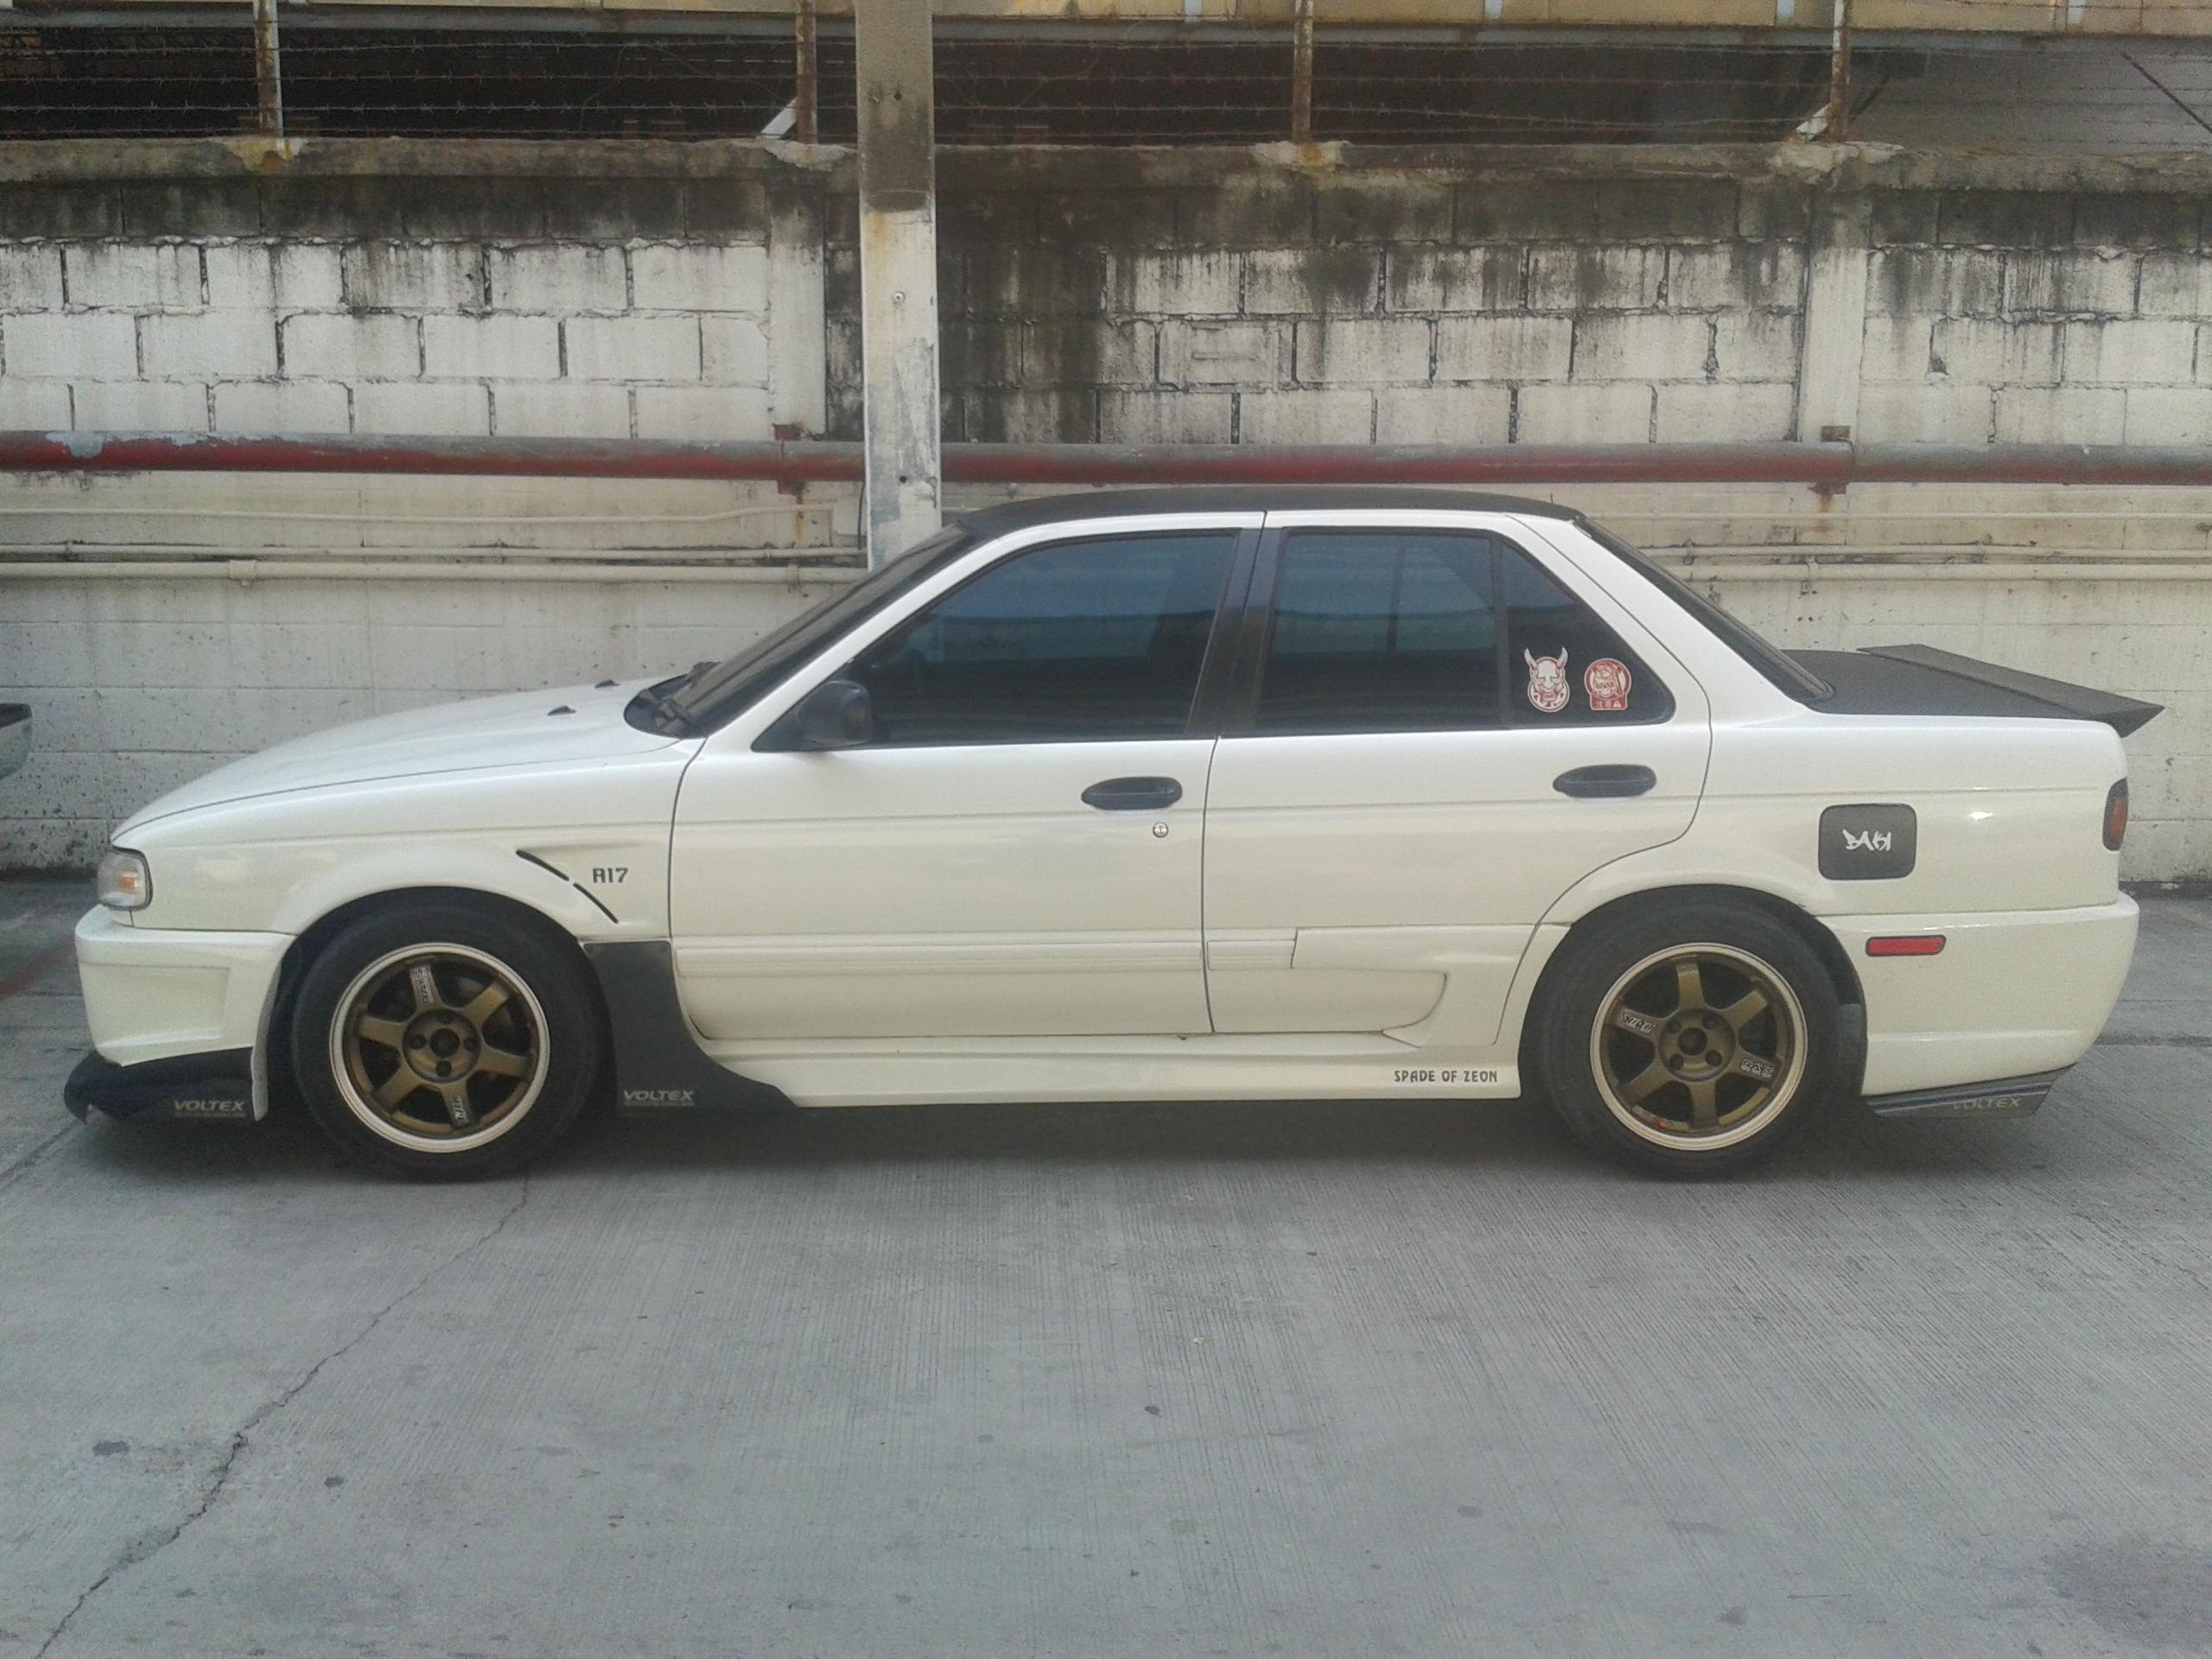 File:Tuned Nissan Sentra (B13) in Thailand 06 jpg